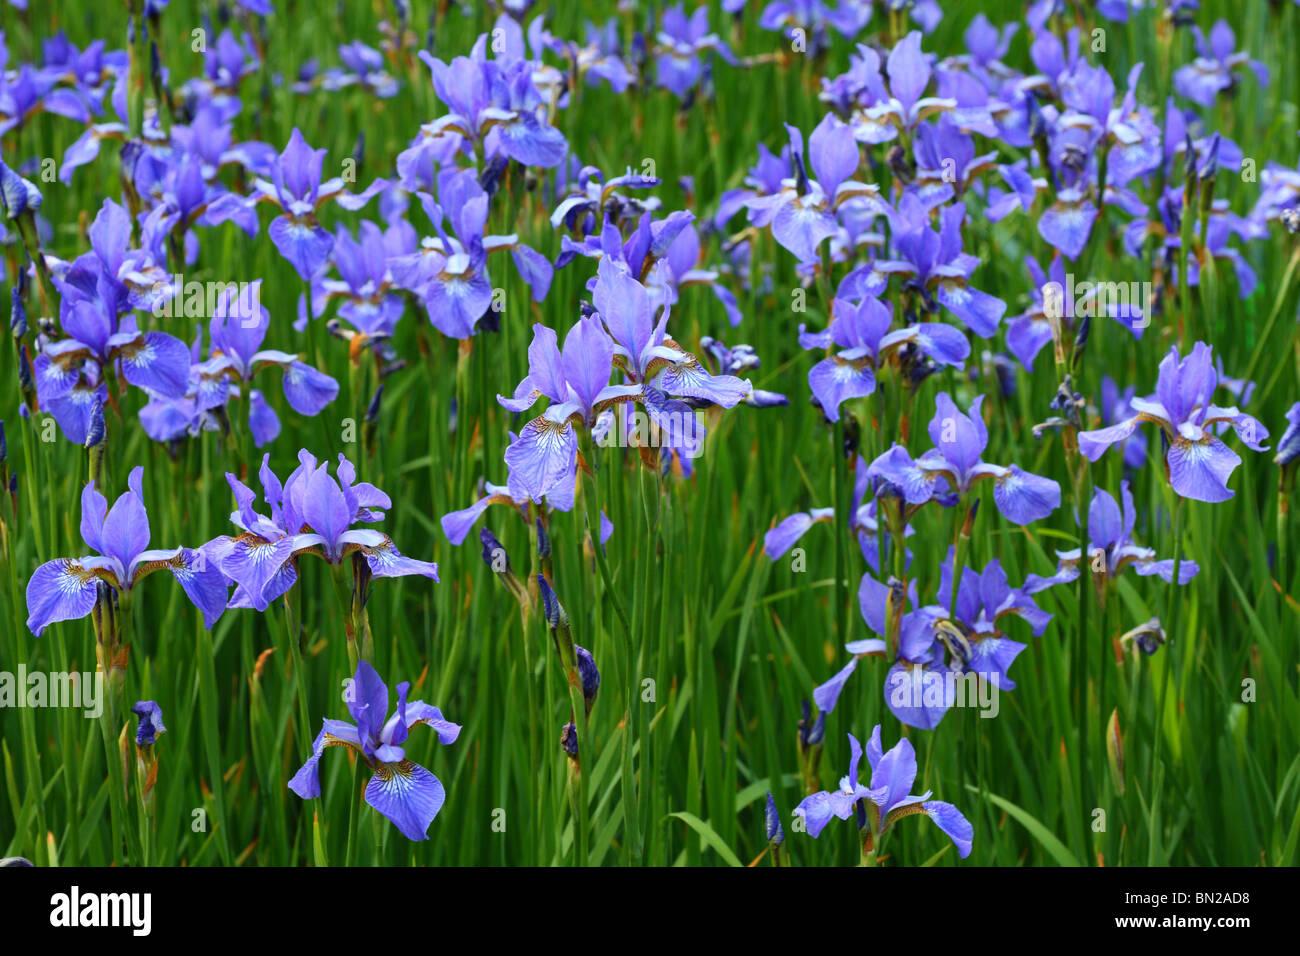 Tn state flower iris image collections flower wallpaper hd wild iris flower facts images flower wallpaper hd tn state flower iris choice image flower wallpaper izmirmasajfo